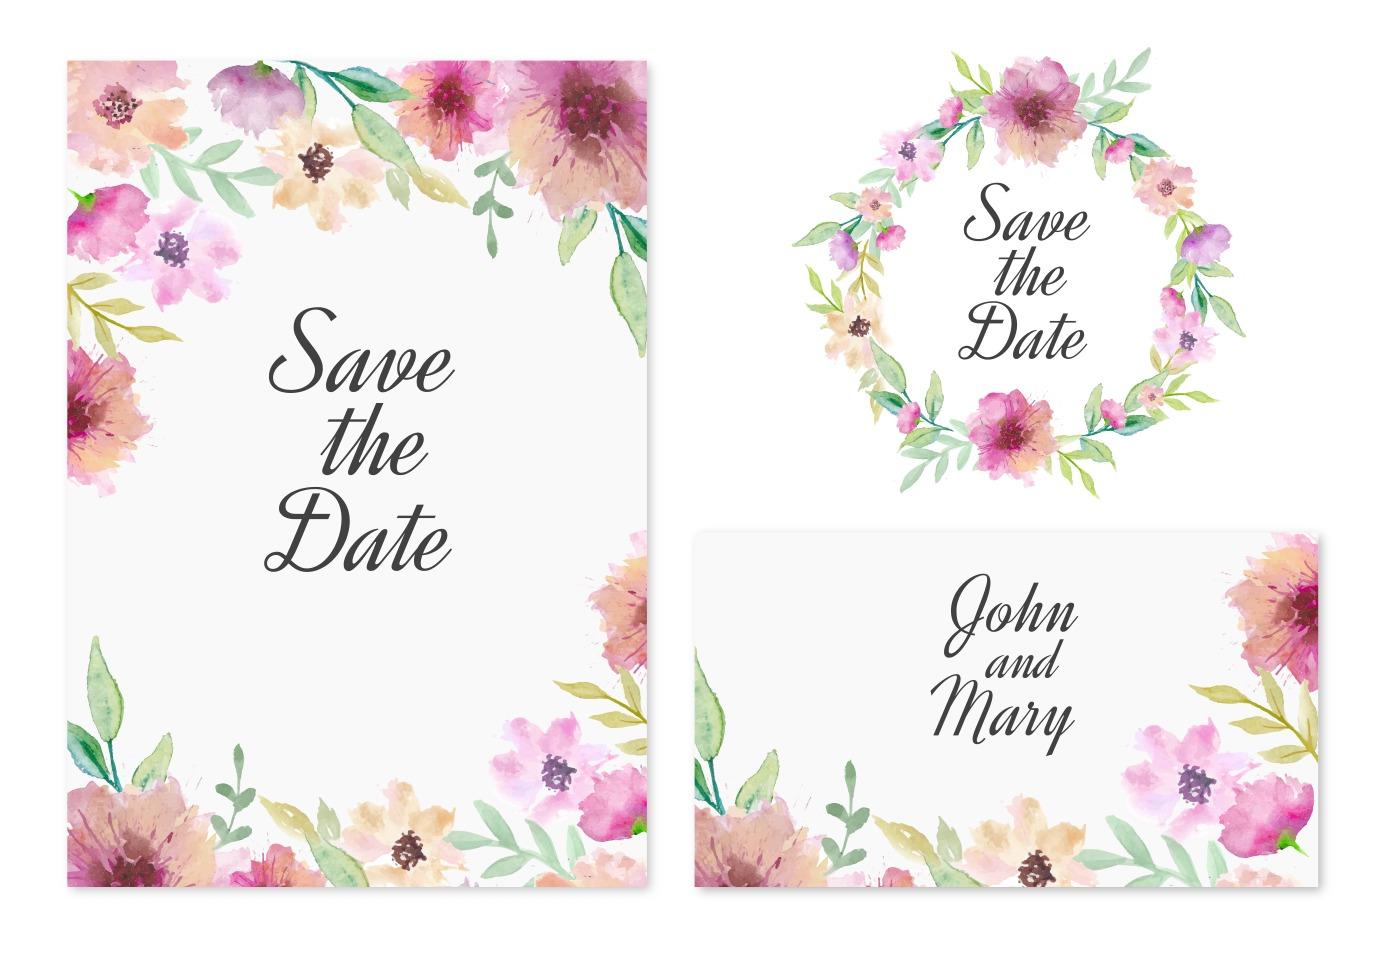 Freier vektor retten die Datums-Karte mit rosa Aquarell-Blumen ...